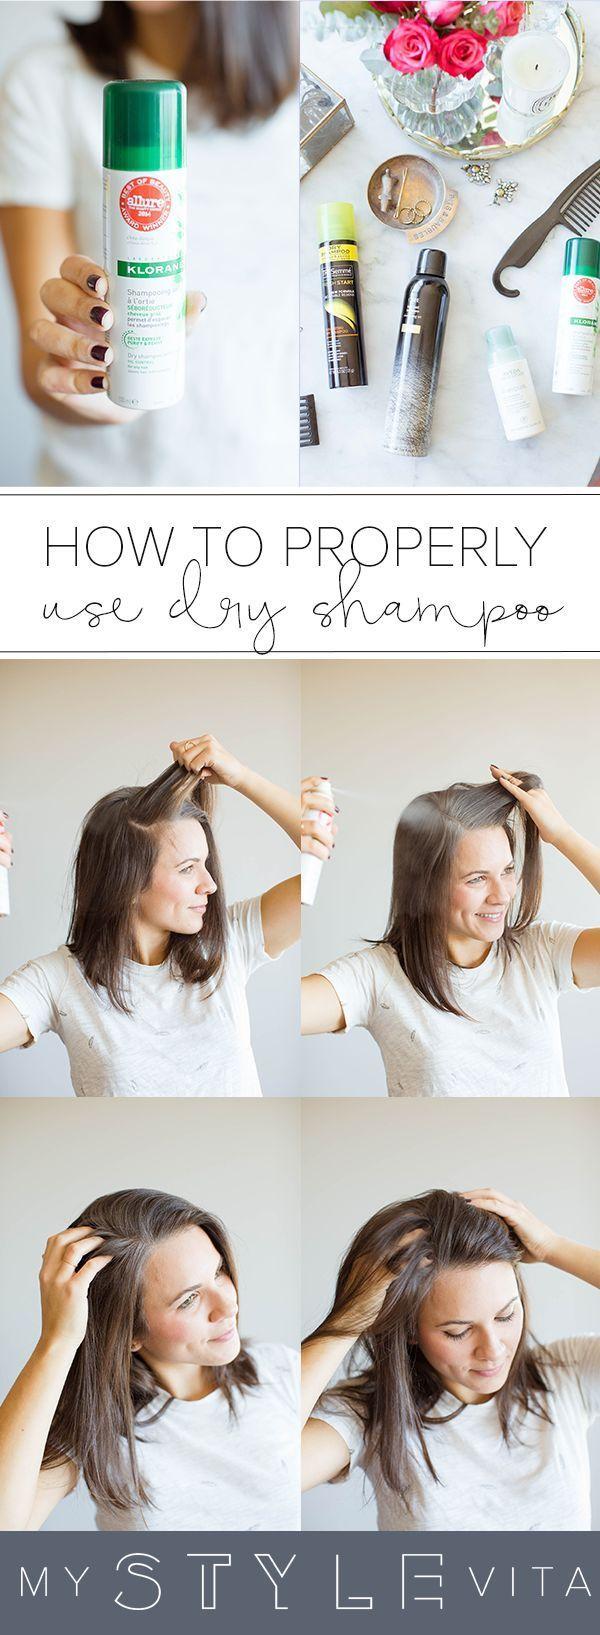 how to properly apply dry shampoo